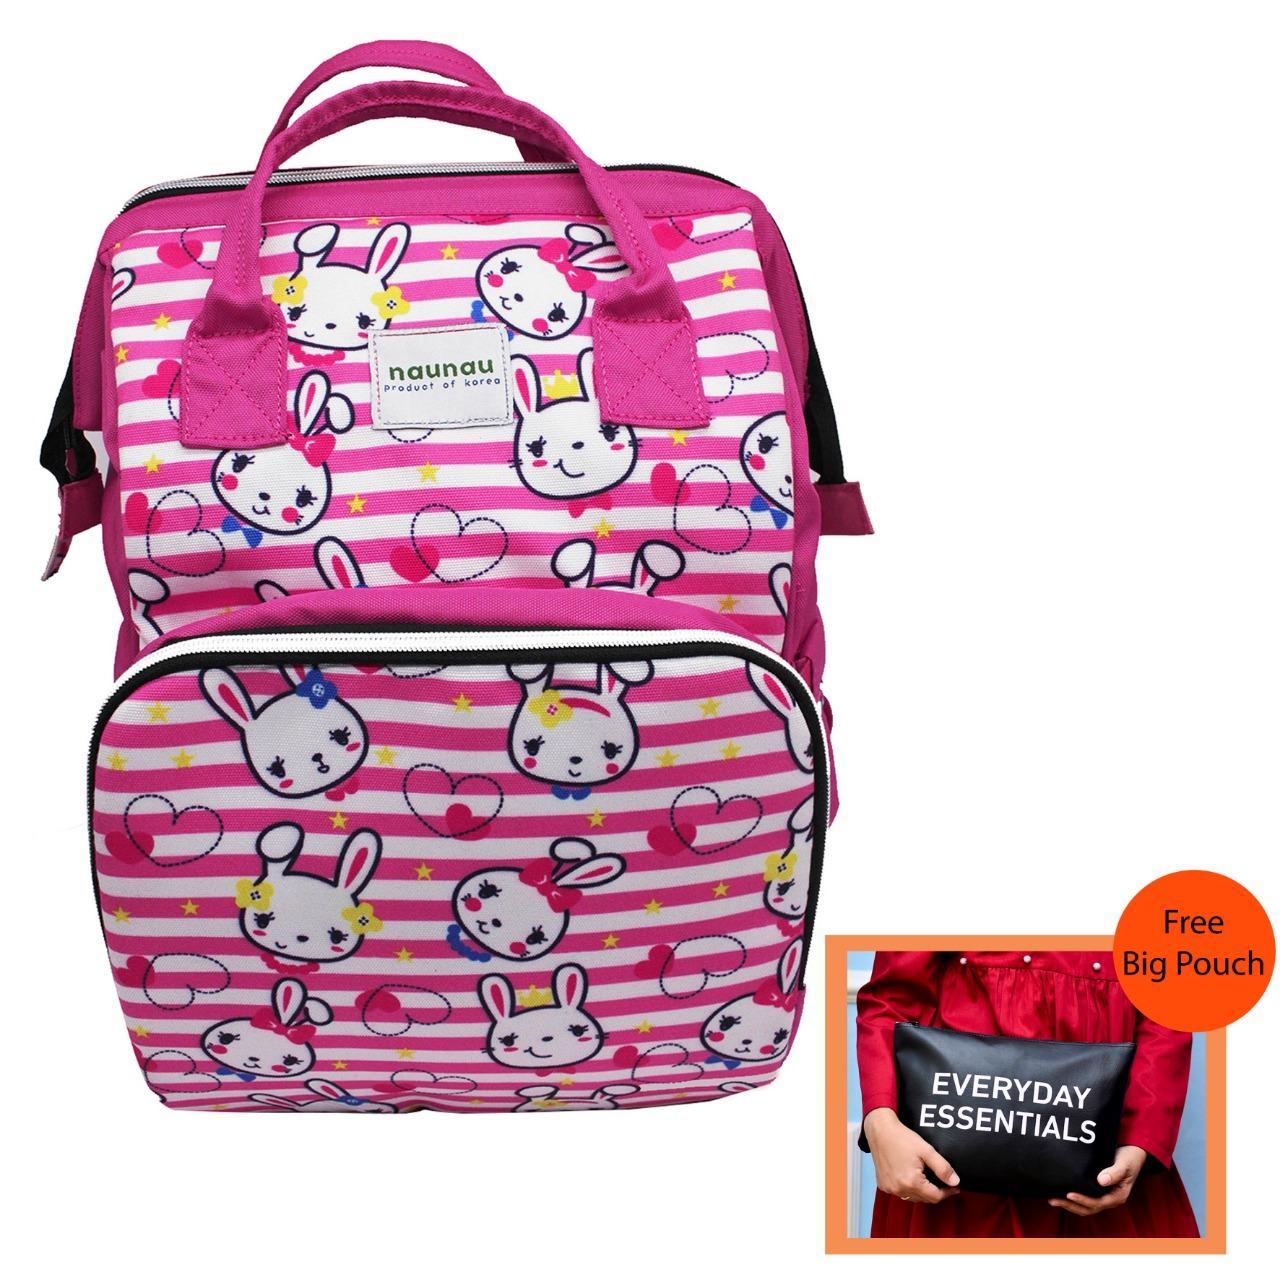 Diapers Ibu Tas Ransel Wanita Multifungsi Tas Bayi Motif Pink Rabbit By Tonga Bag